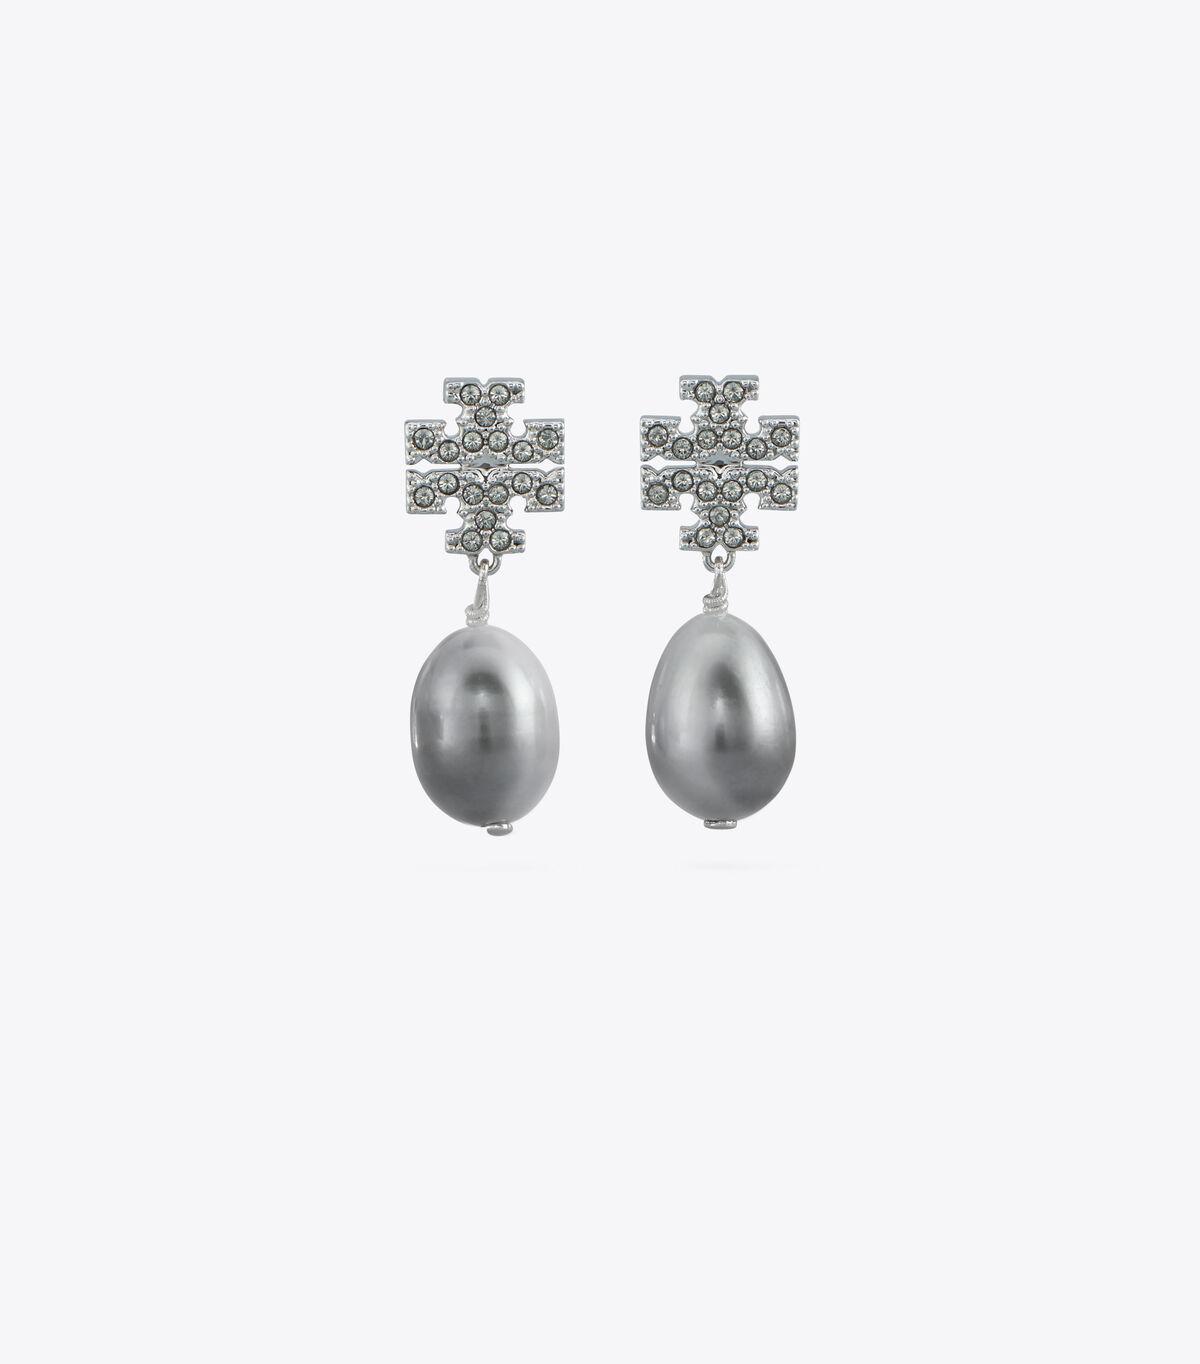 KIRA PAVE PEARL DROP EARRING | 056 | Drop Earring